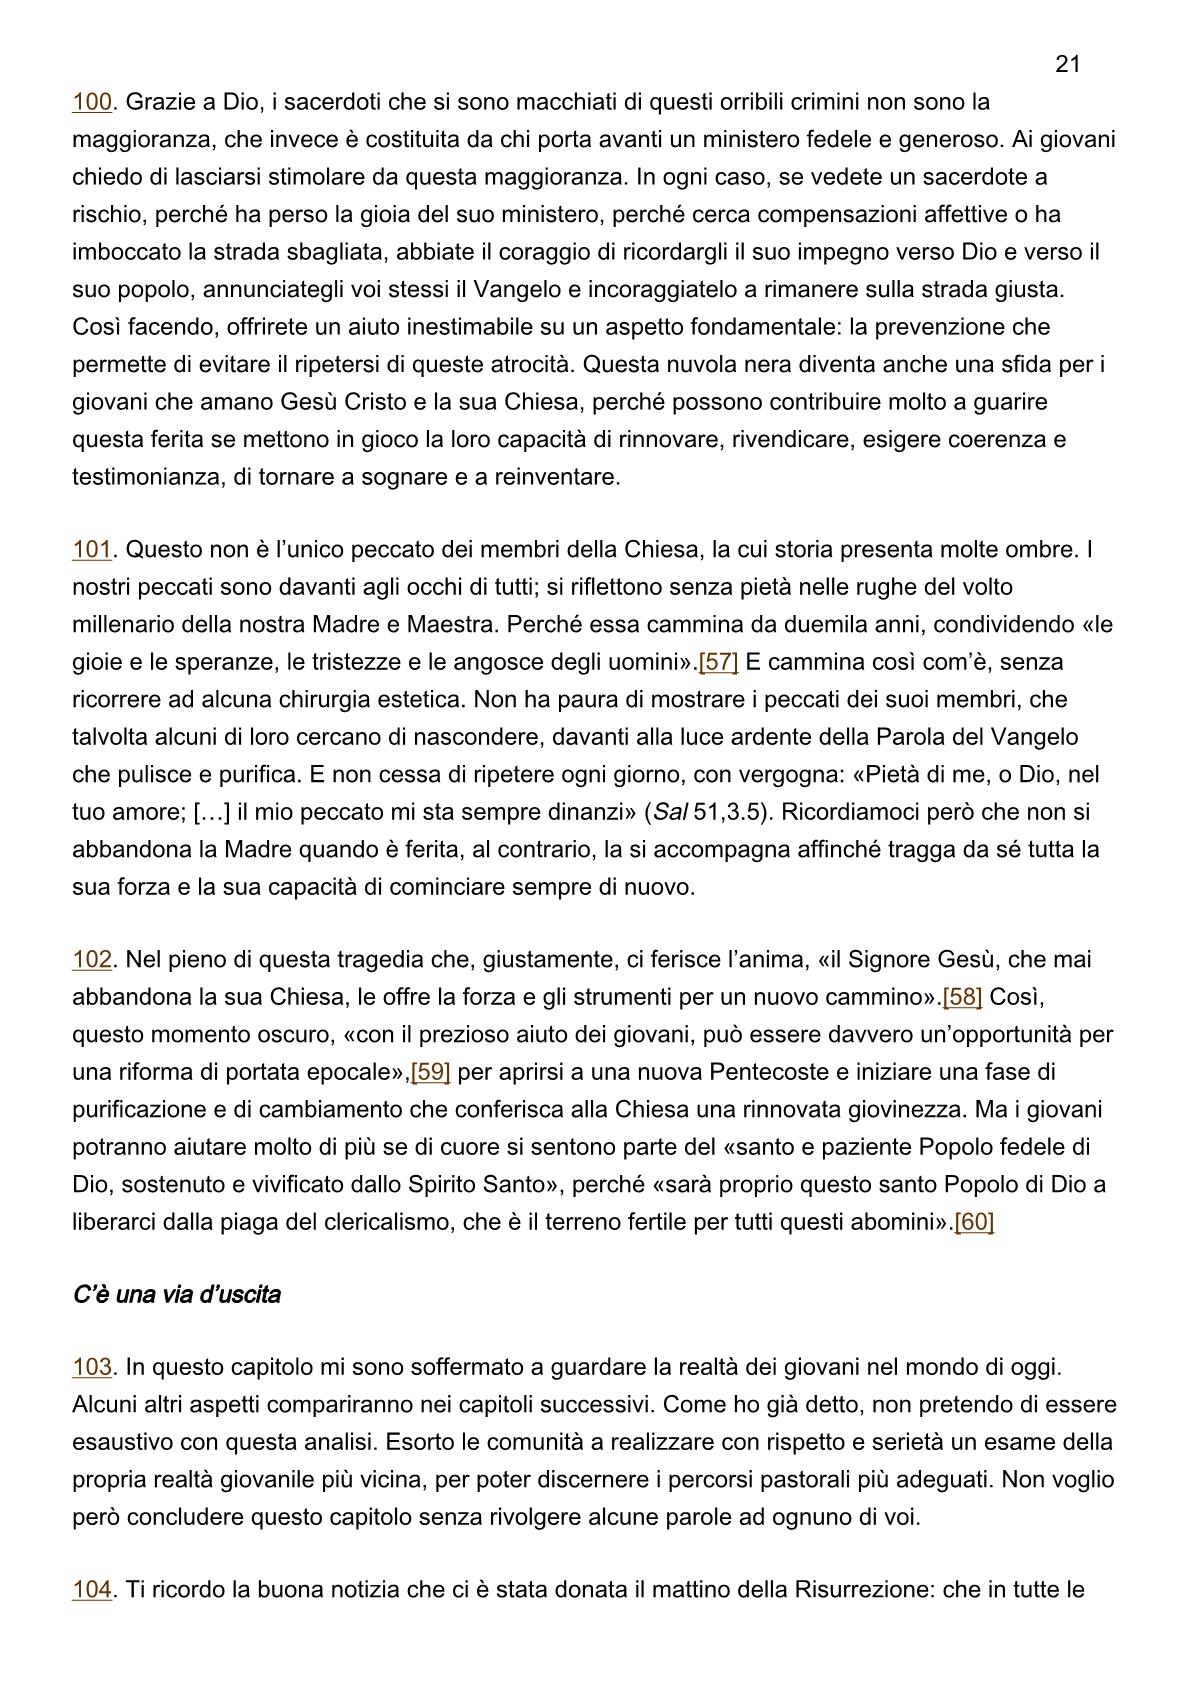 papa-francesco_esortazione-ap_20190325_christus-vivit21